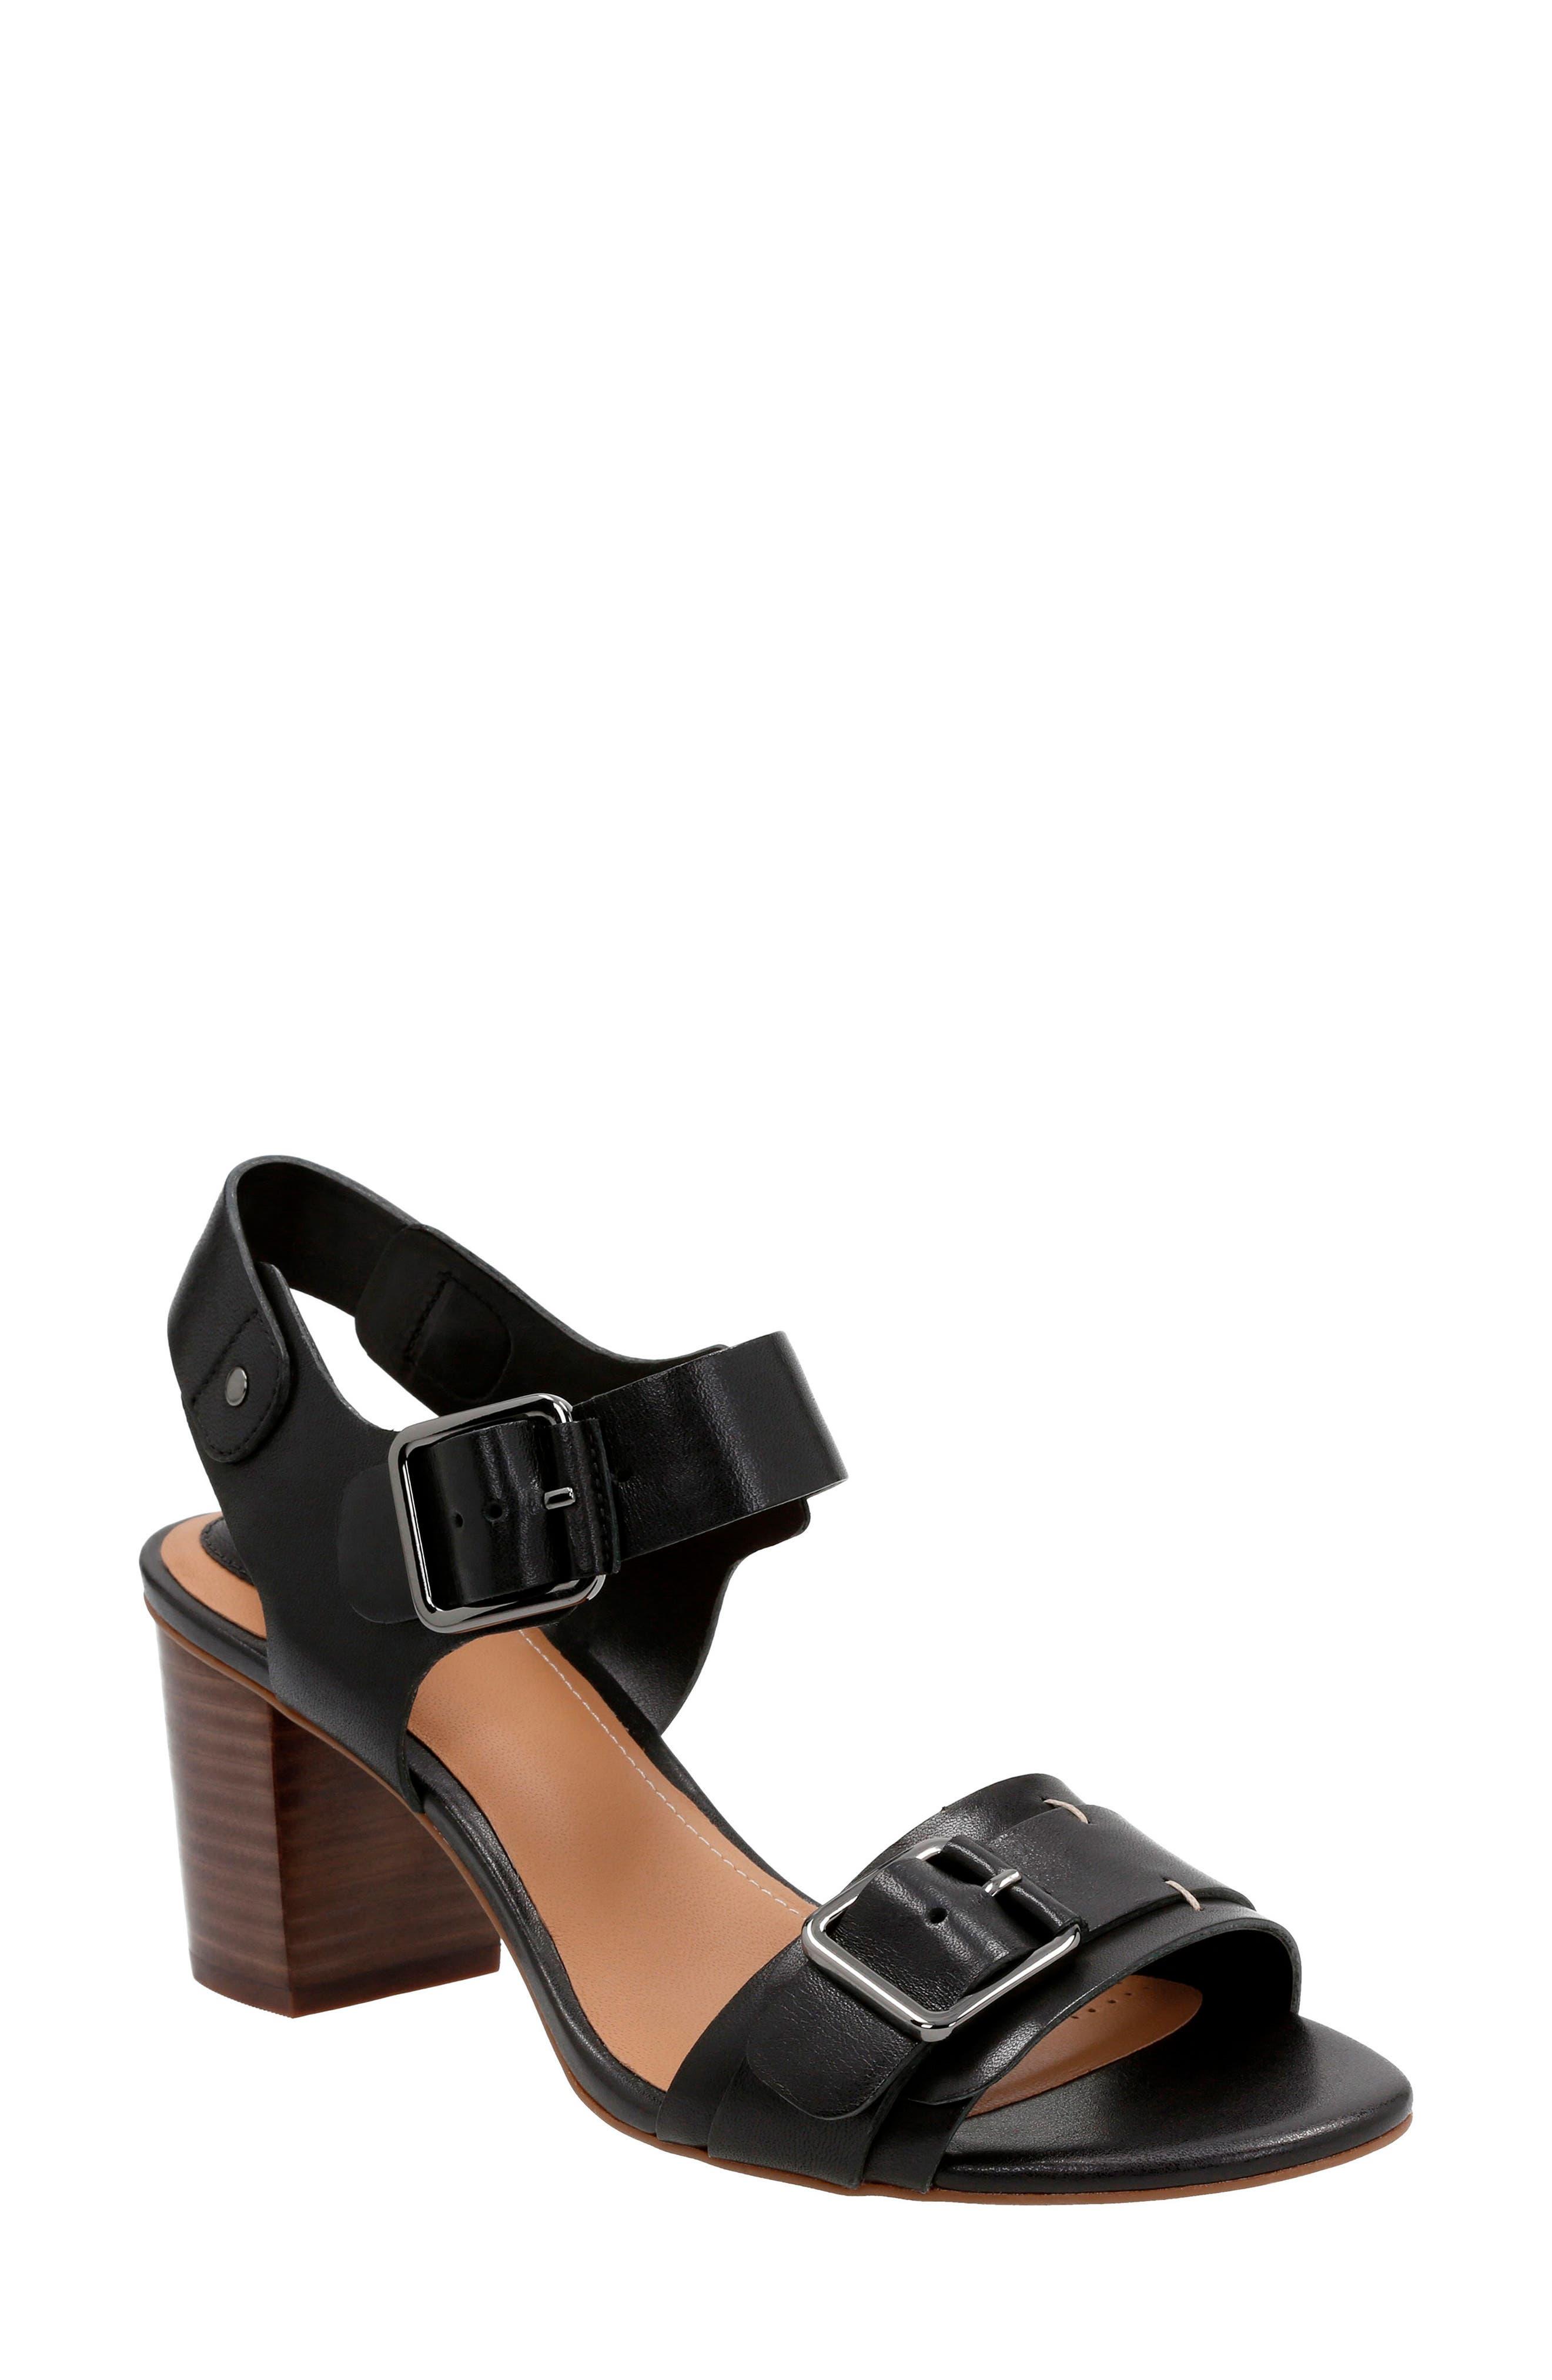 Ralene Dazzle Sandal,                         Main,                         color, Black Leather